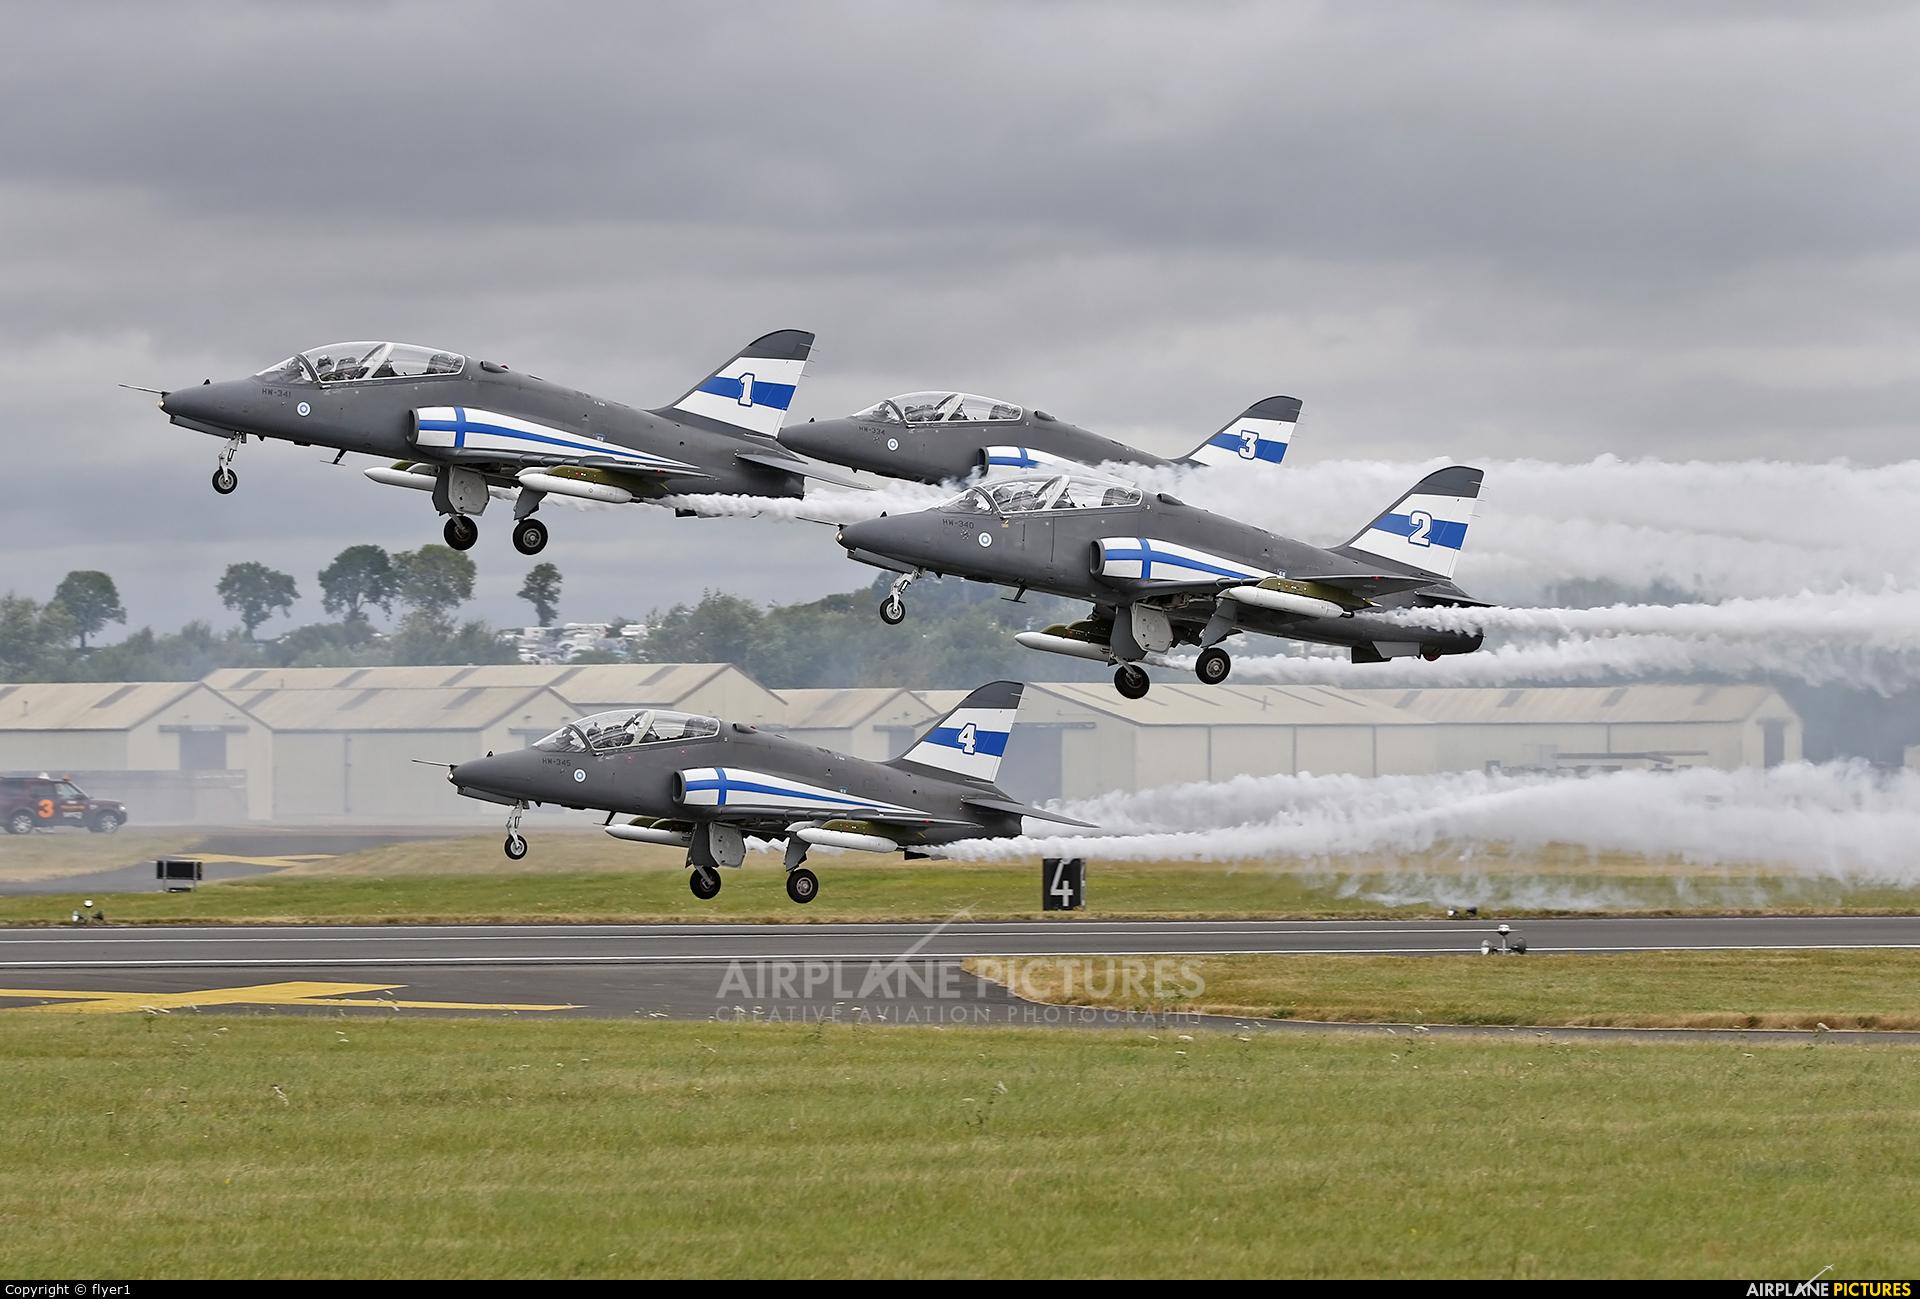 Finland - Air Force: Midnight Hawks HW-340 aircraft at Fairford